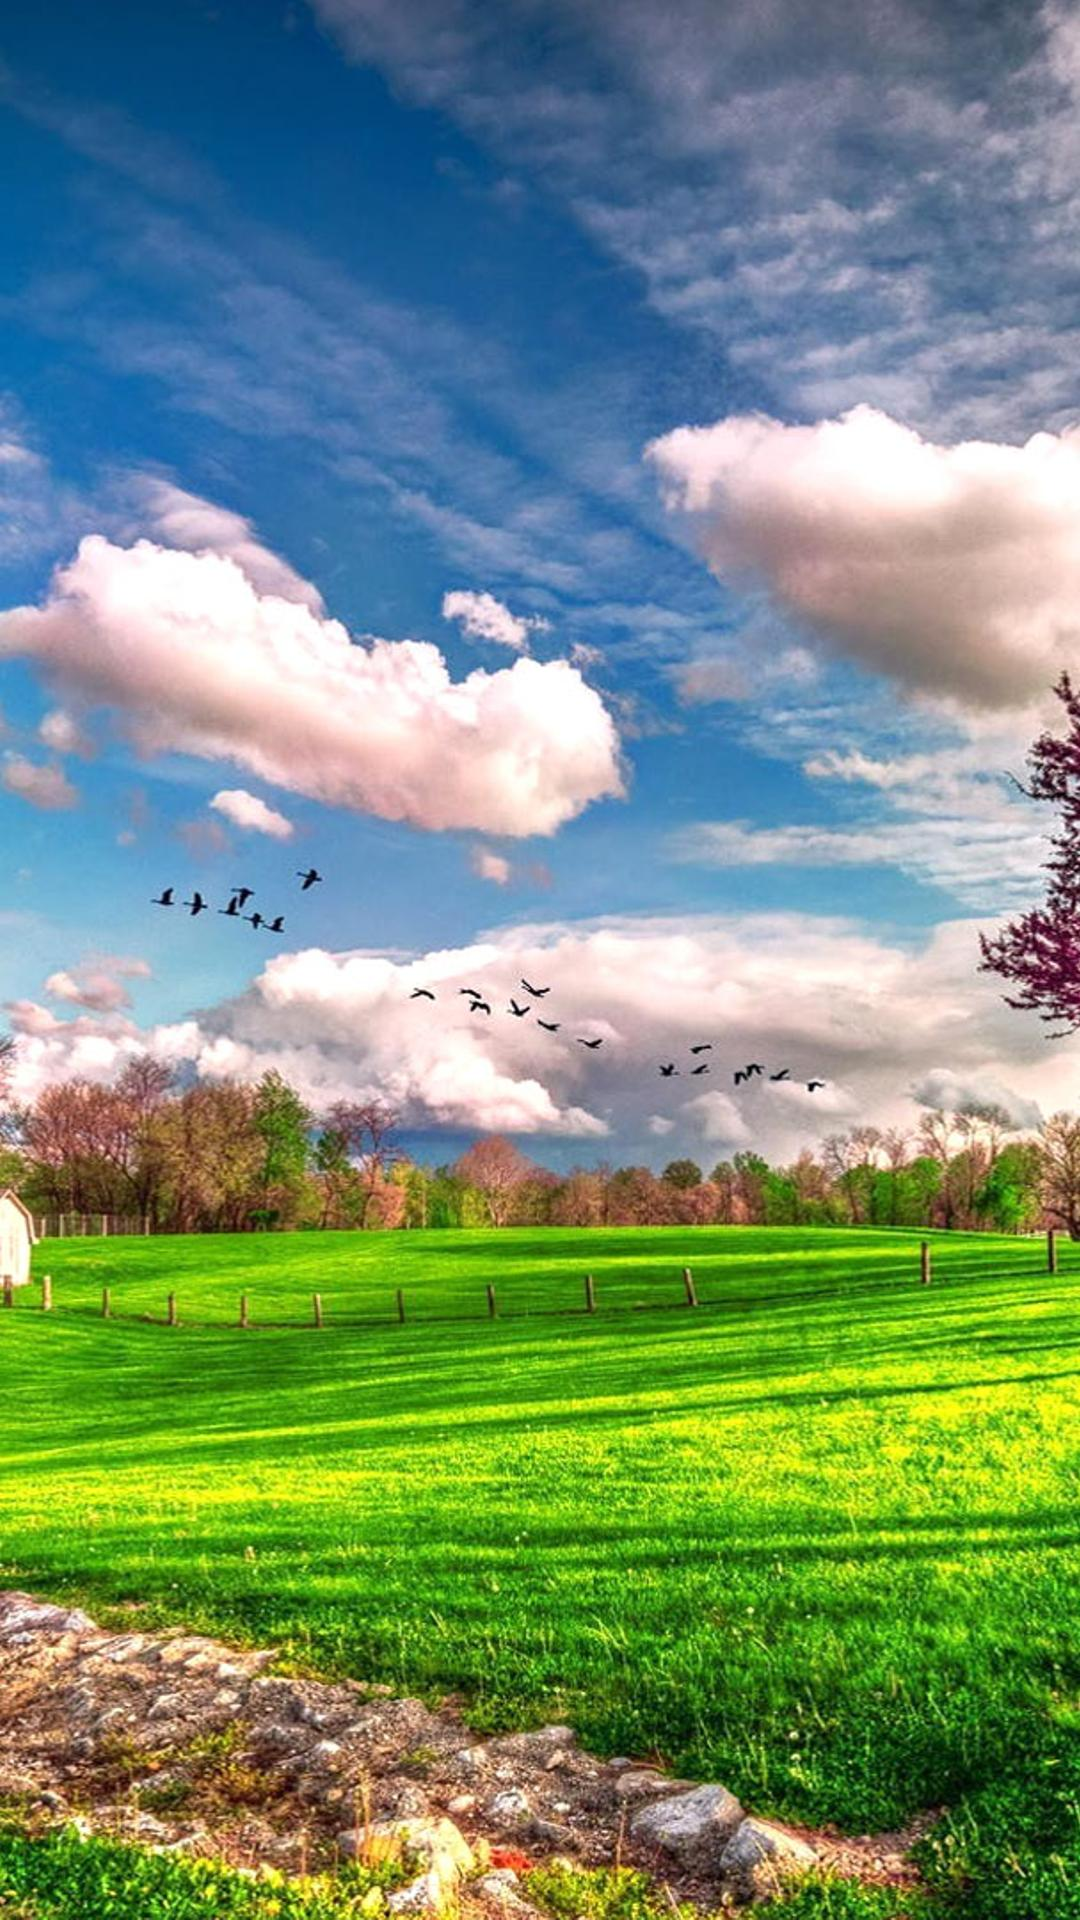 Hd wallpaper 1080x1920 - Landscape Beautiful Spring Nature Hd Wallpaper Wallpaper Download 1080x1920